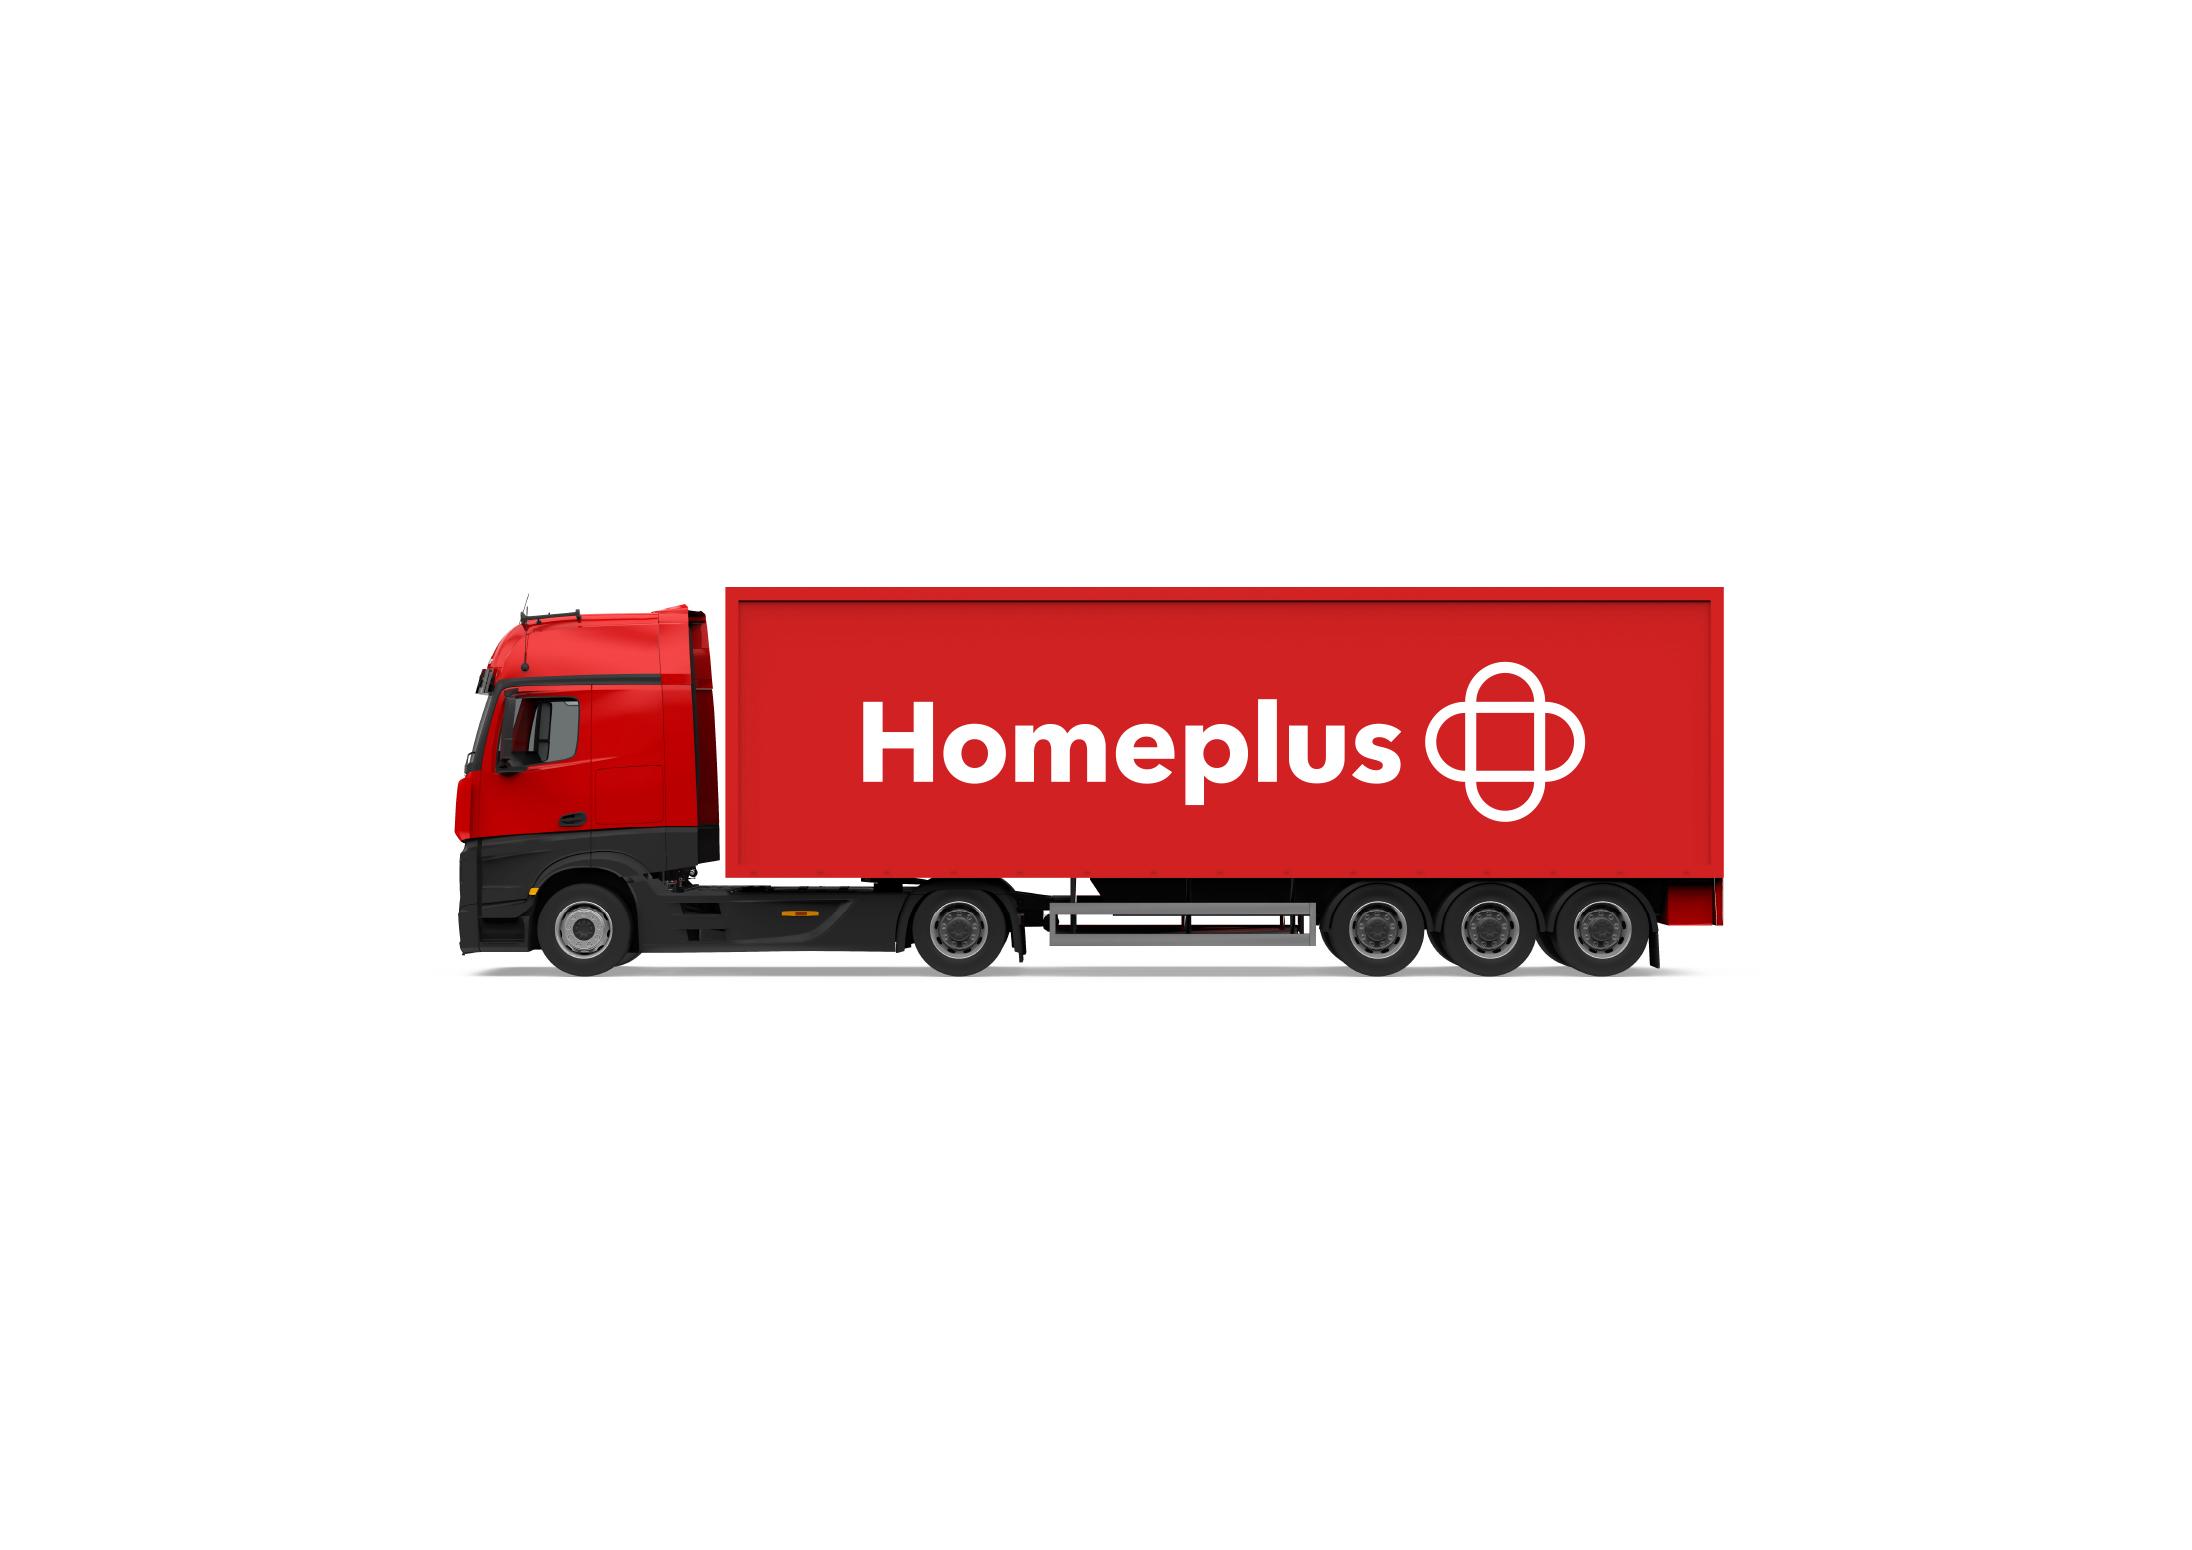 Homeplus_truck.jpg